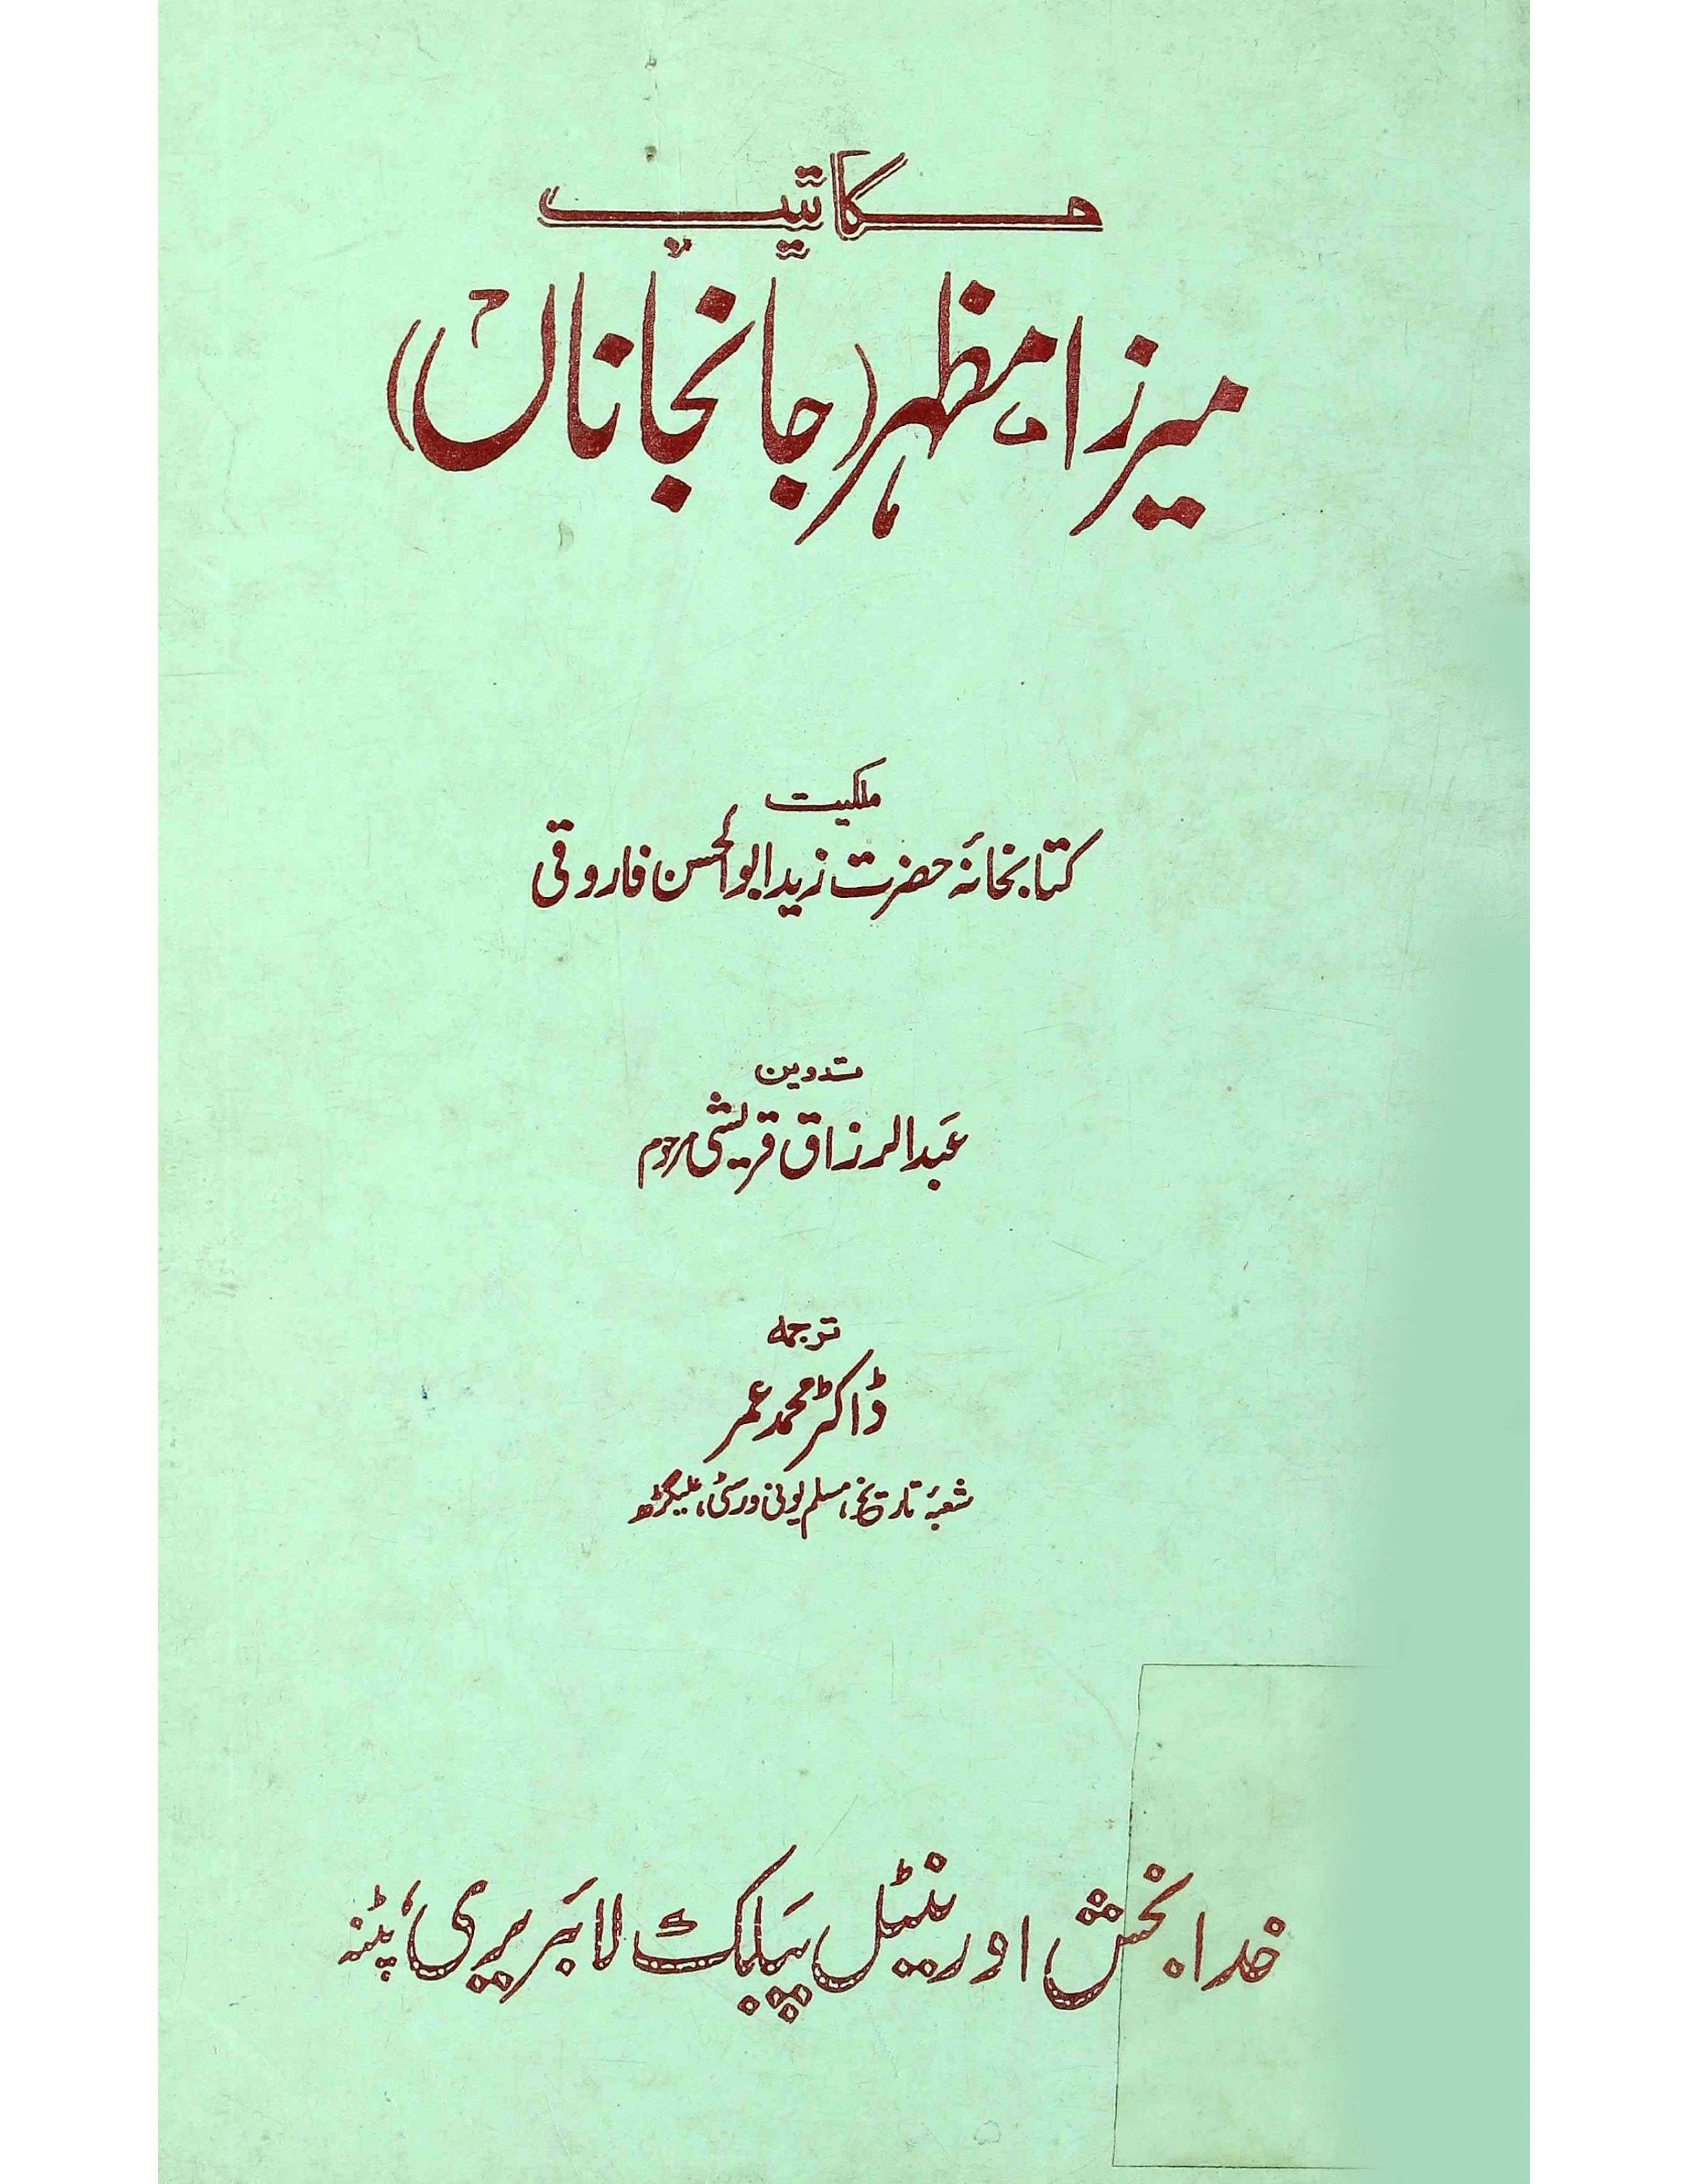 Makateeb-e-Mirza Mazhar Janjana